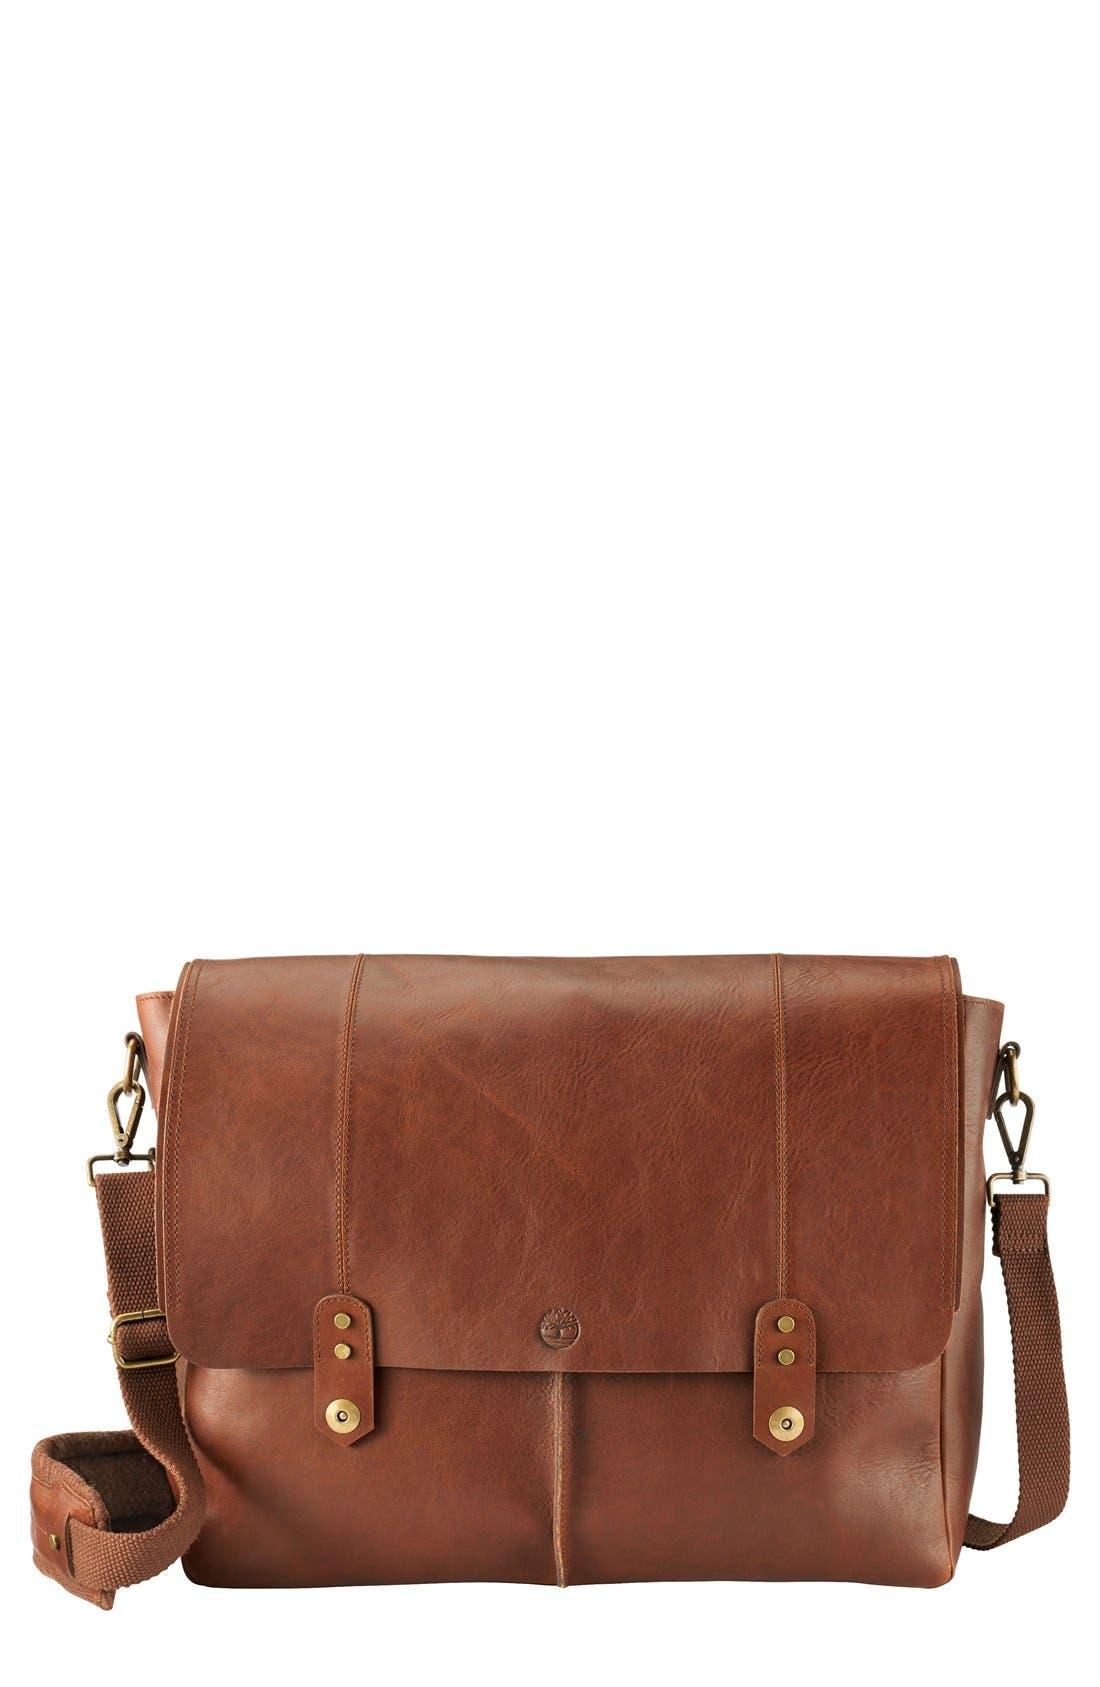 Main Image - Timberland 'Walnut Hill' Leather Messenger Bag